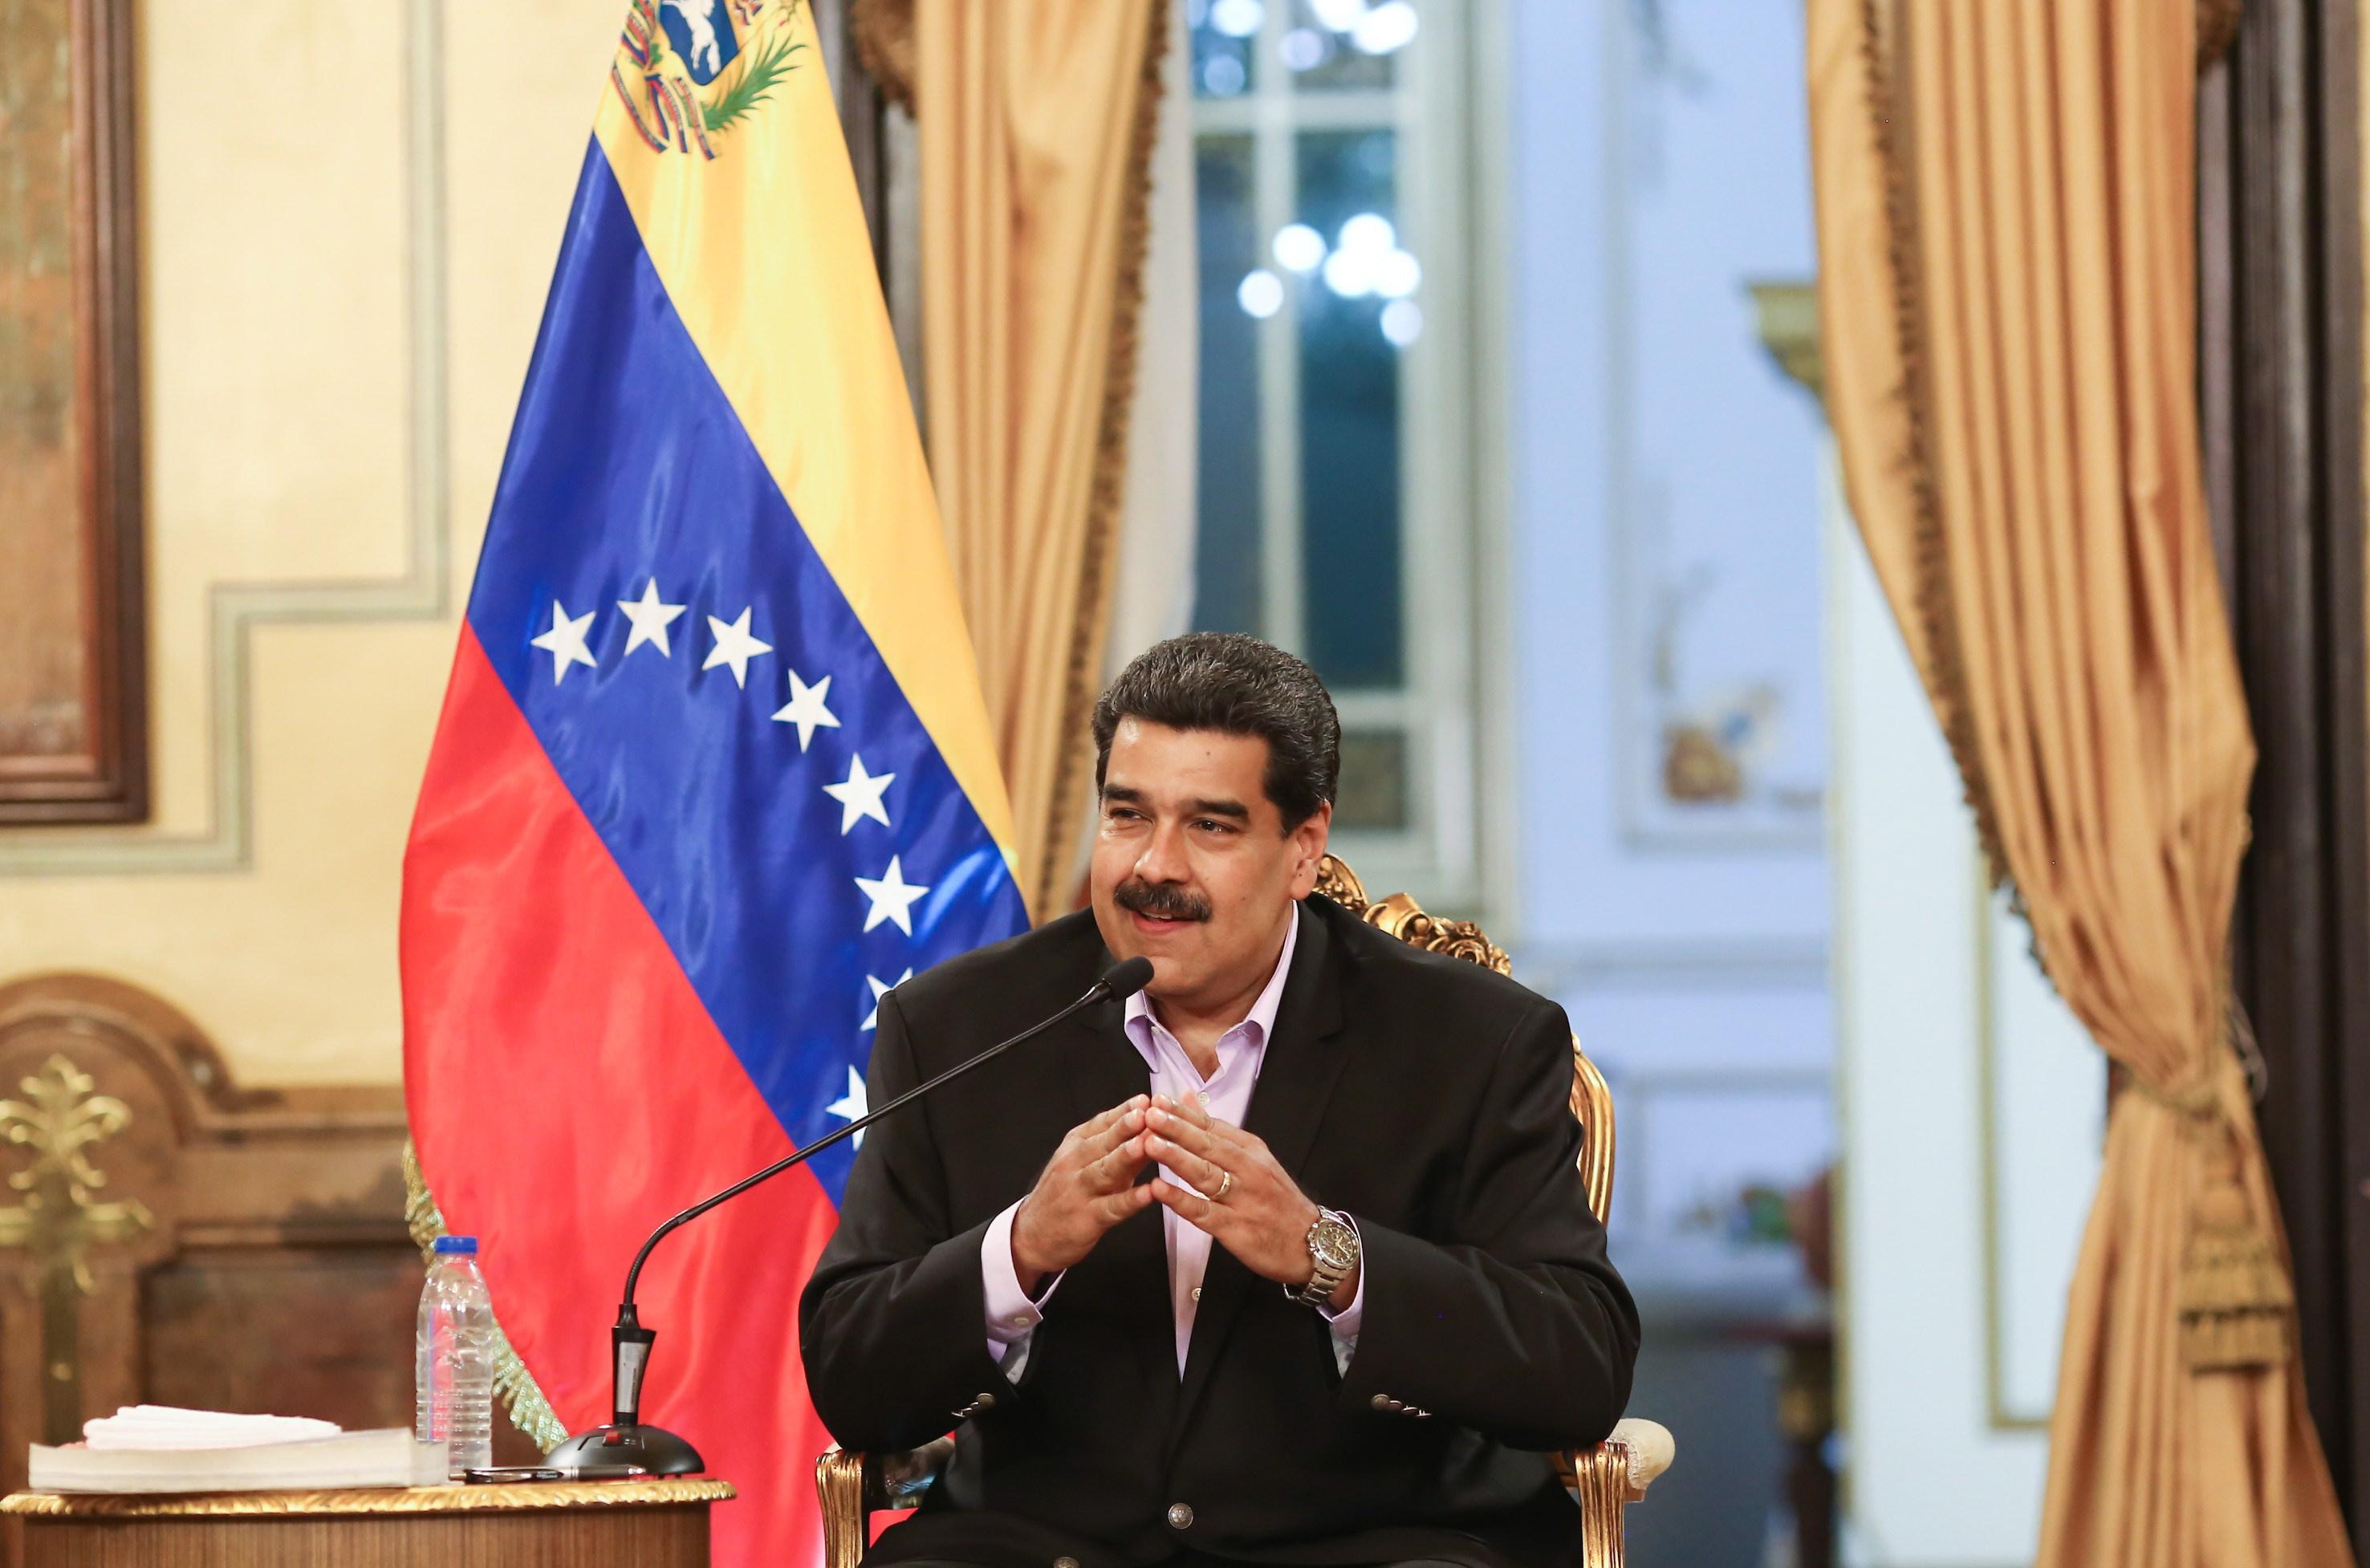 Washington upozorava Caracas da ne napada Guaidoa